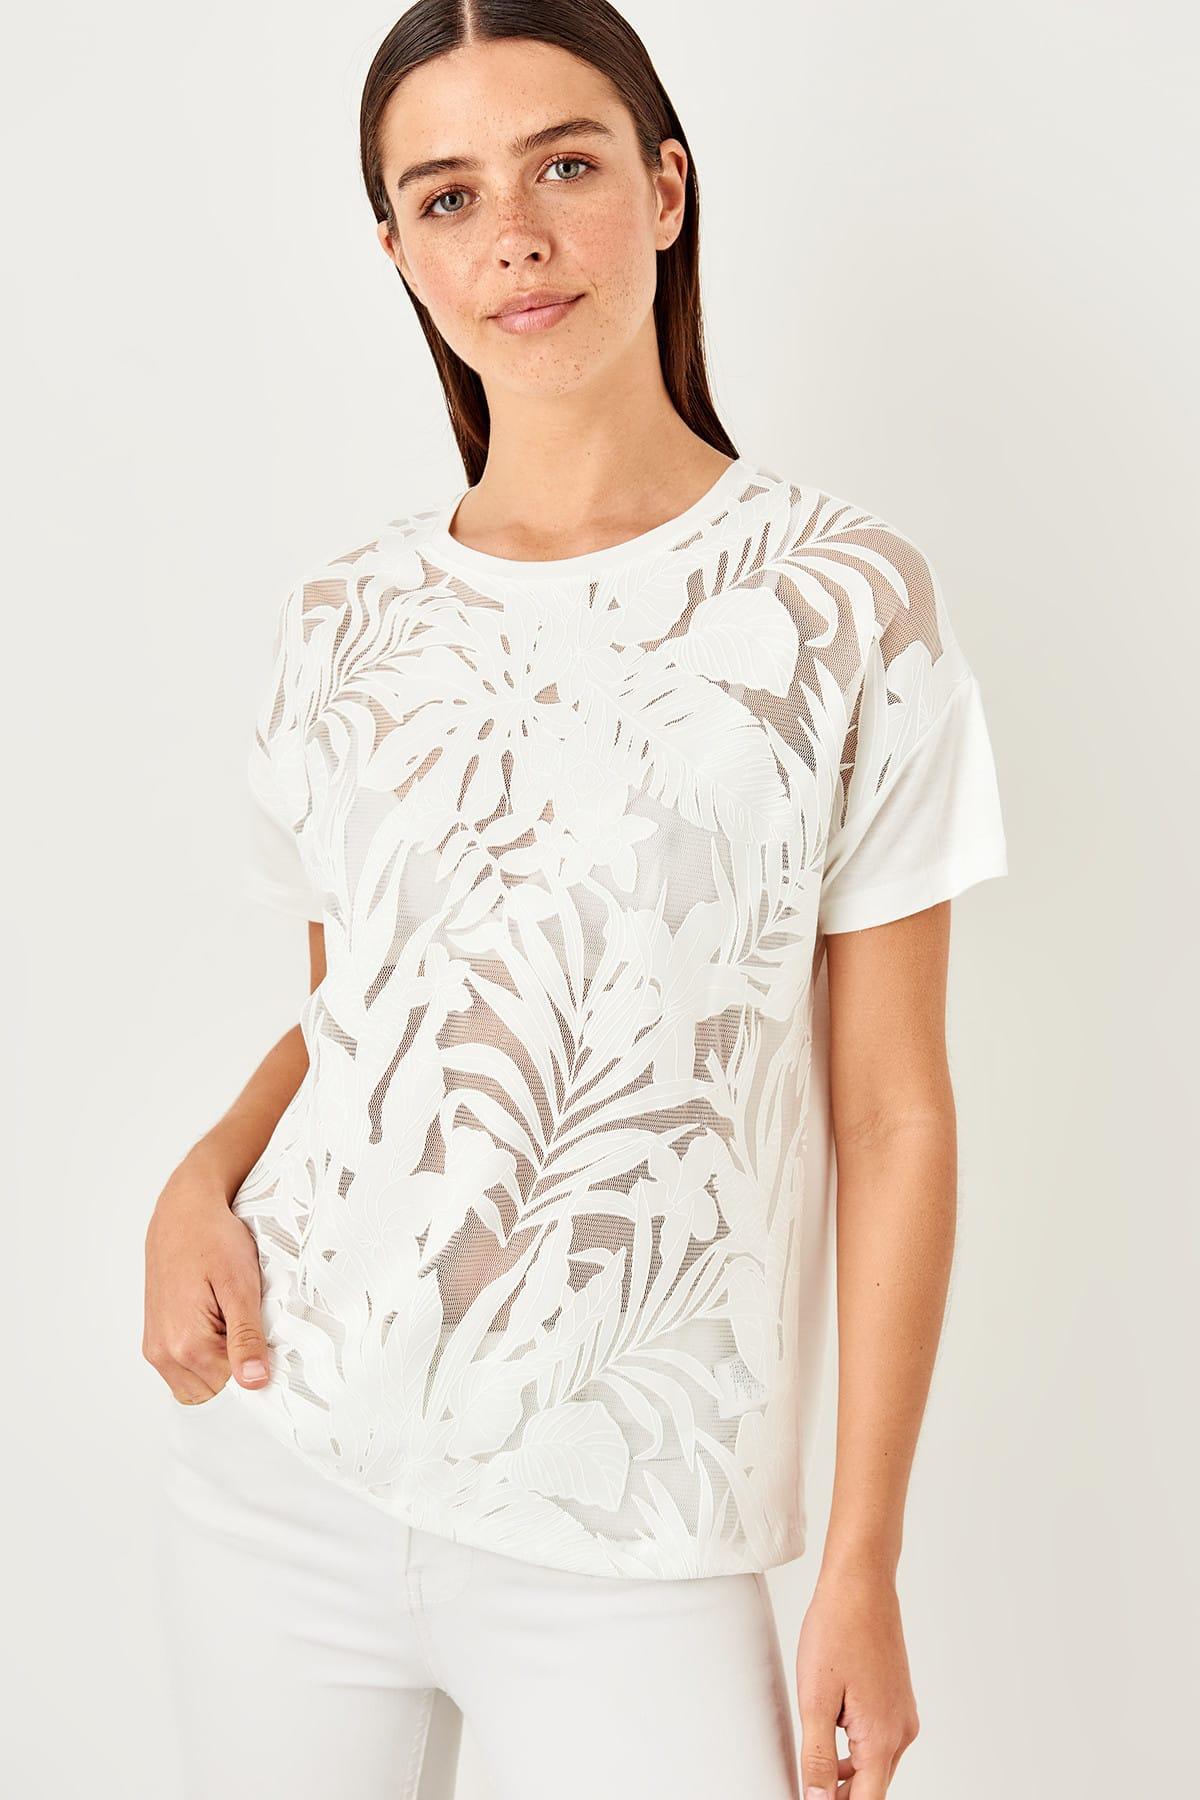 Trendyol White See-Through Detaylı Knitted Blouse TWOSS19FV0129